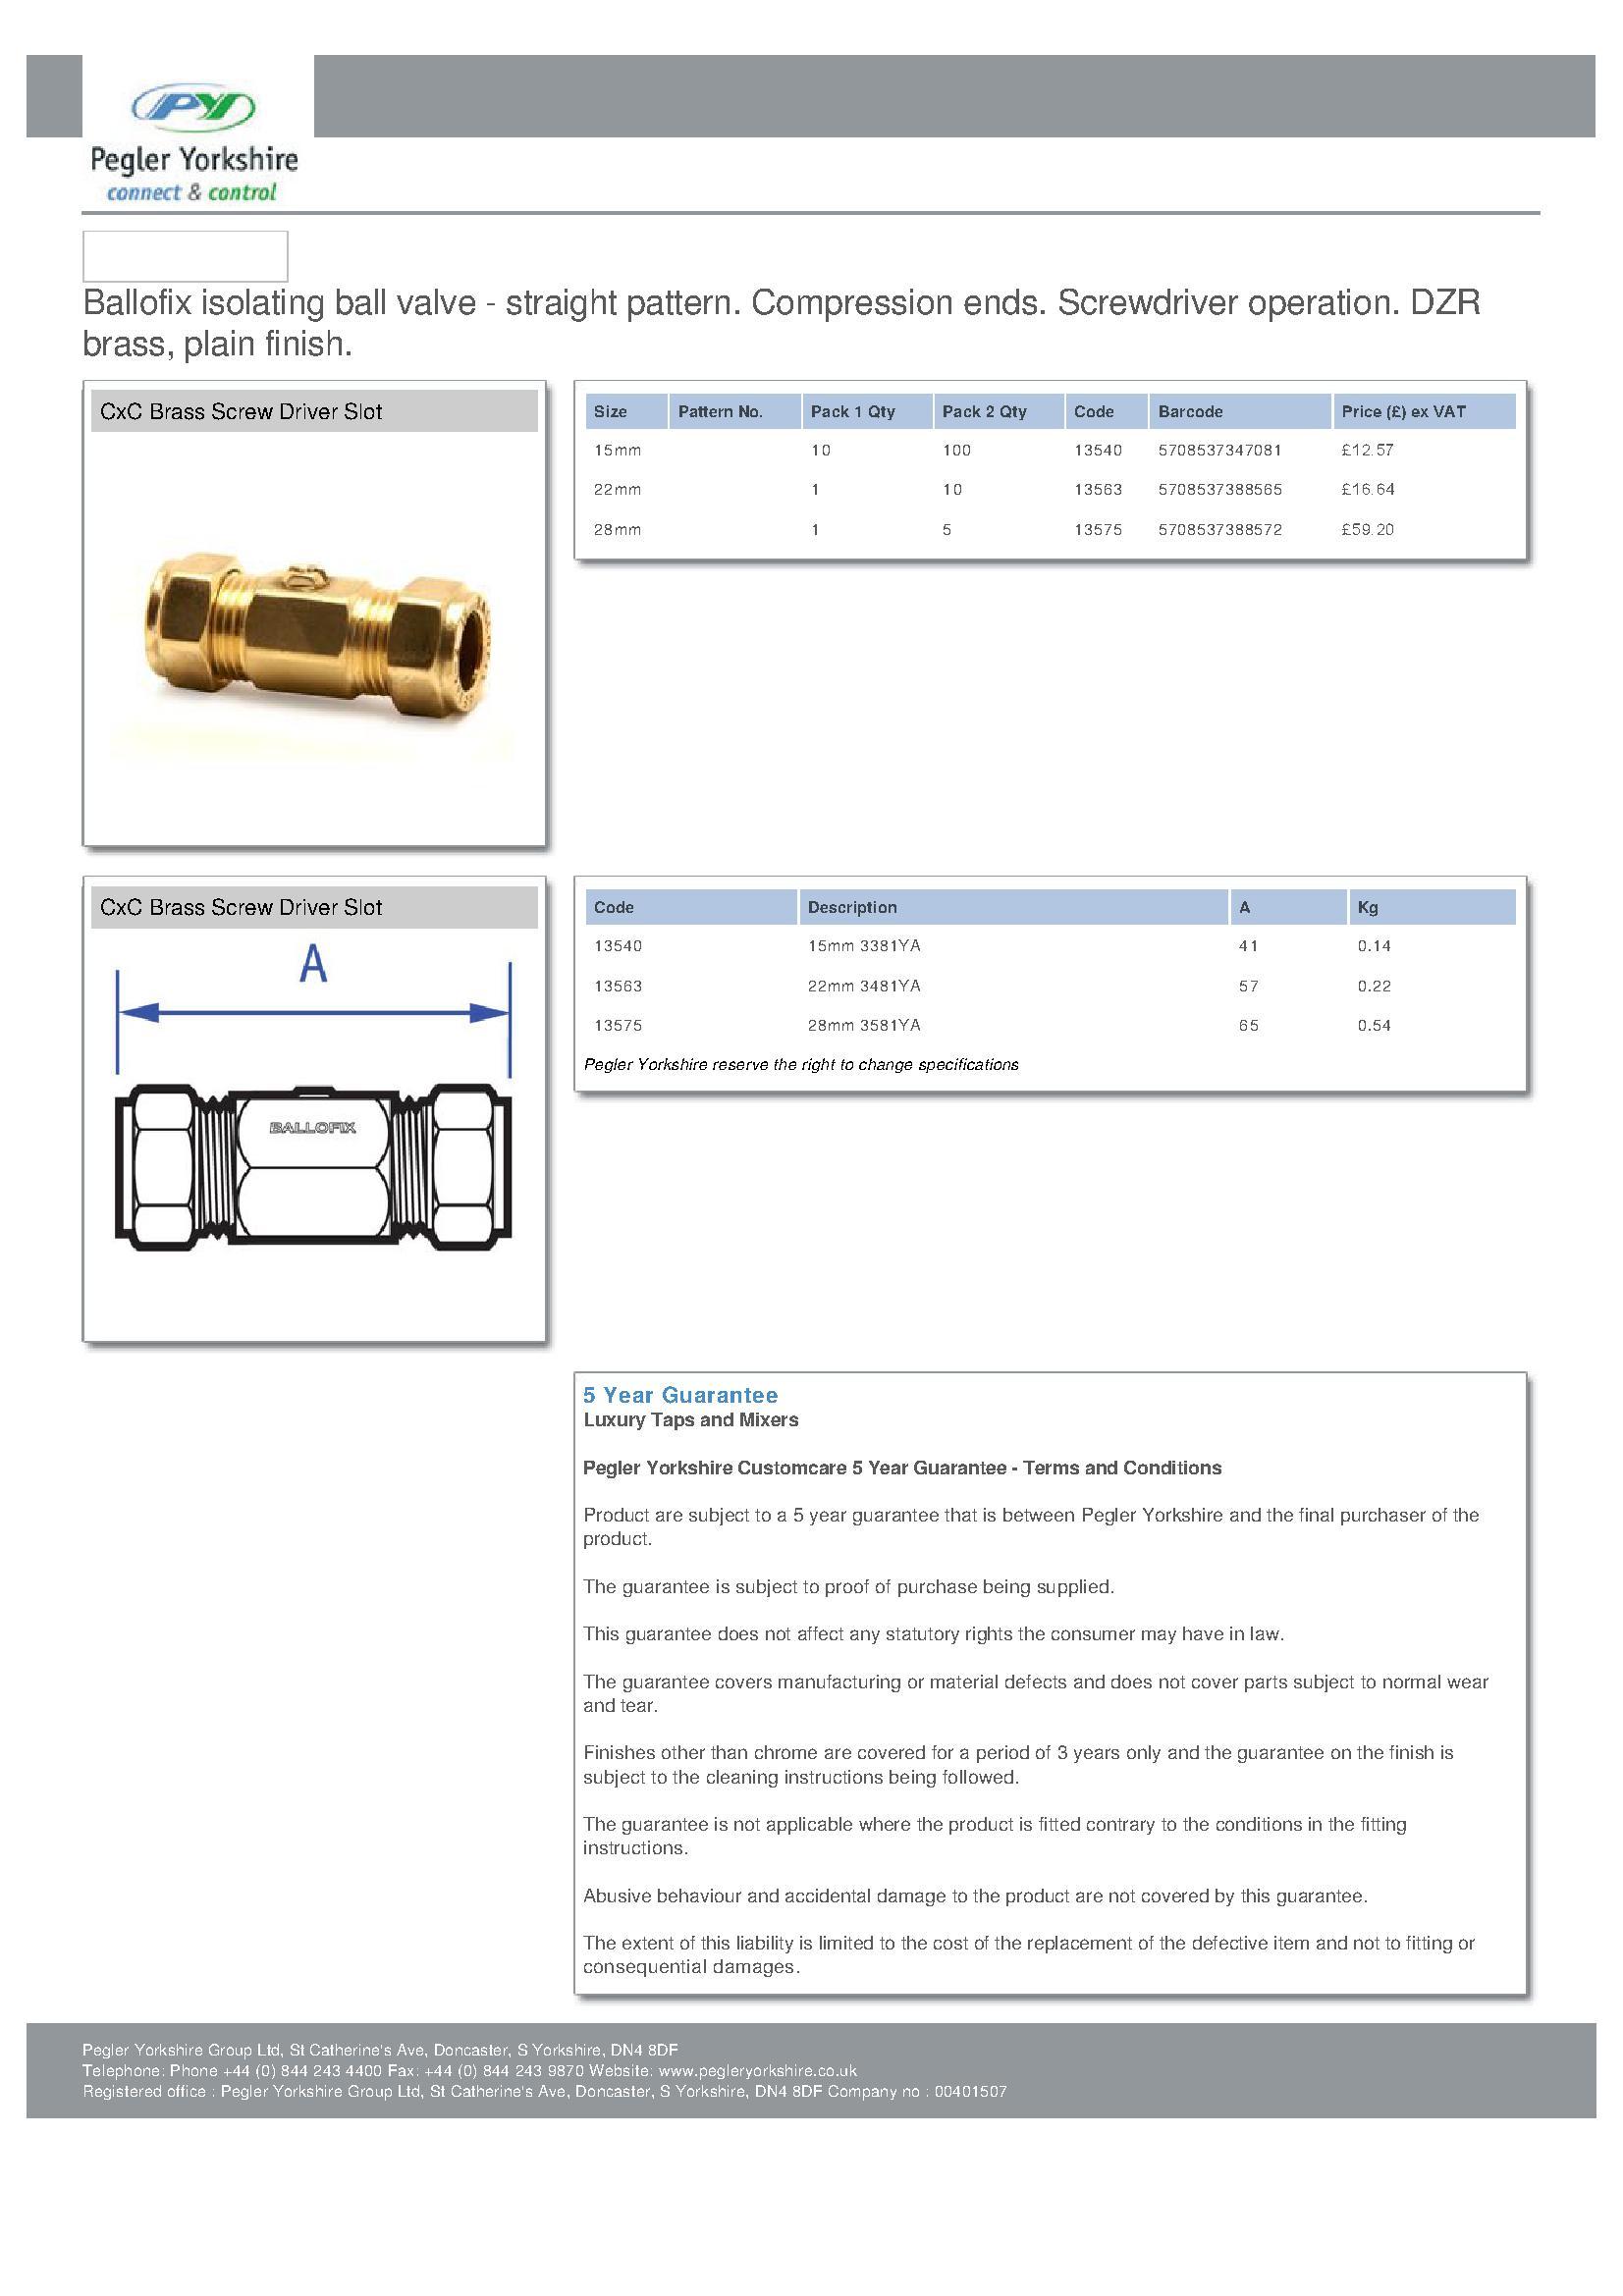 Ballofix 3481YA 22mm Copper TO Copper Brass PDF